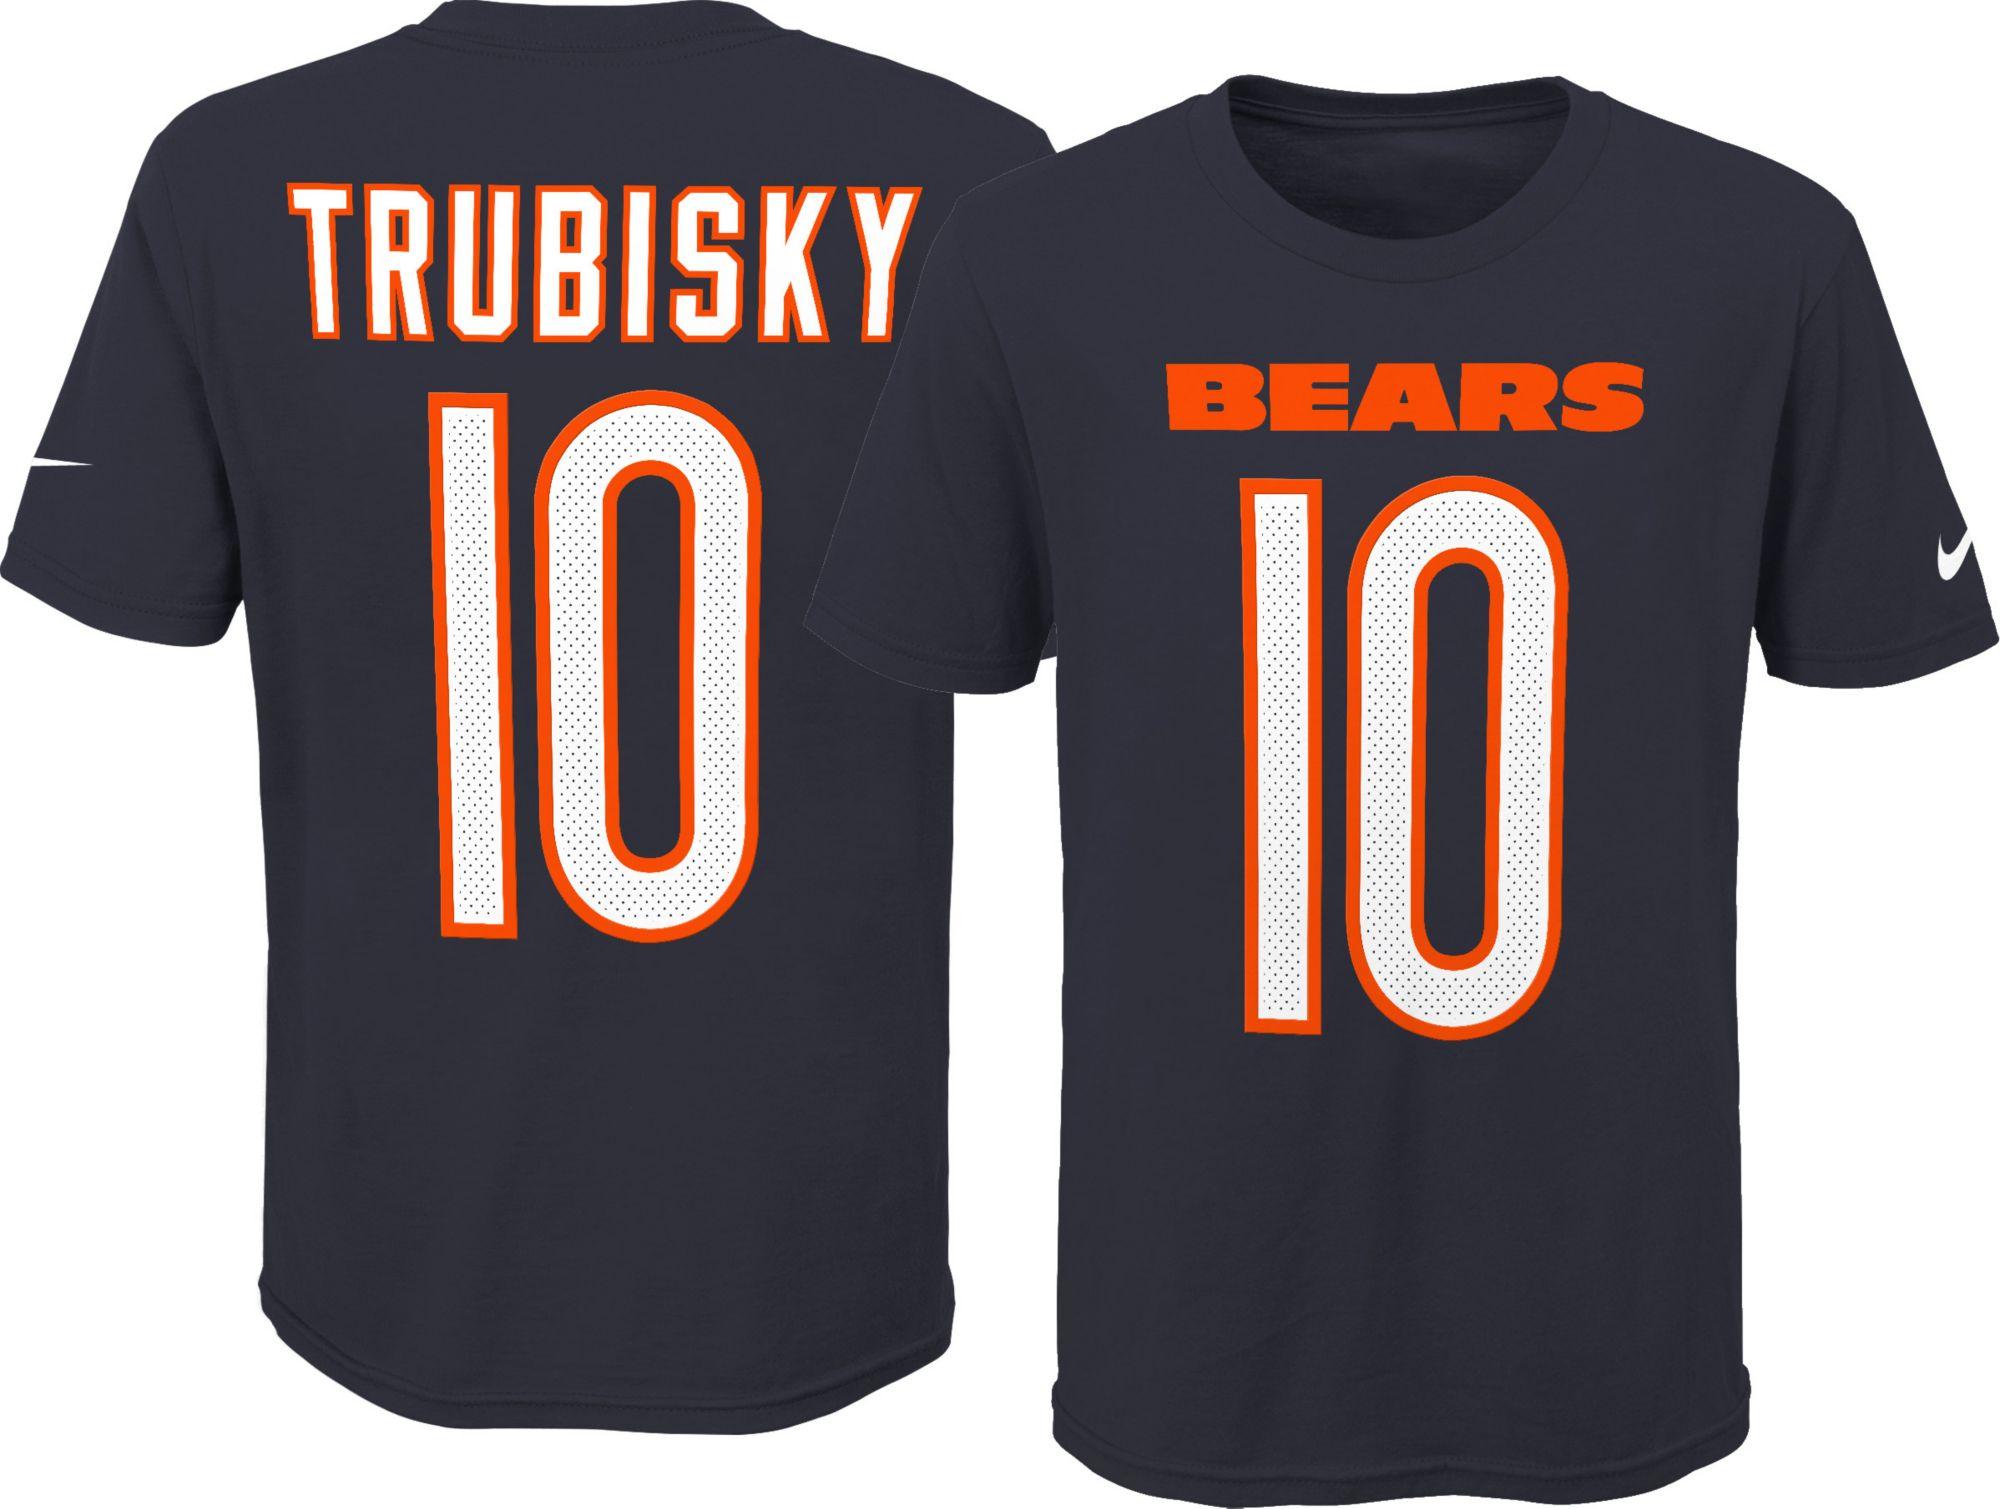 Nike Youth Chicago Bears Mitchell Trubisky  10 Pride Navy T-Shirt ... db57accb4